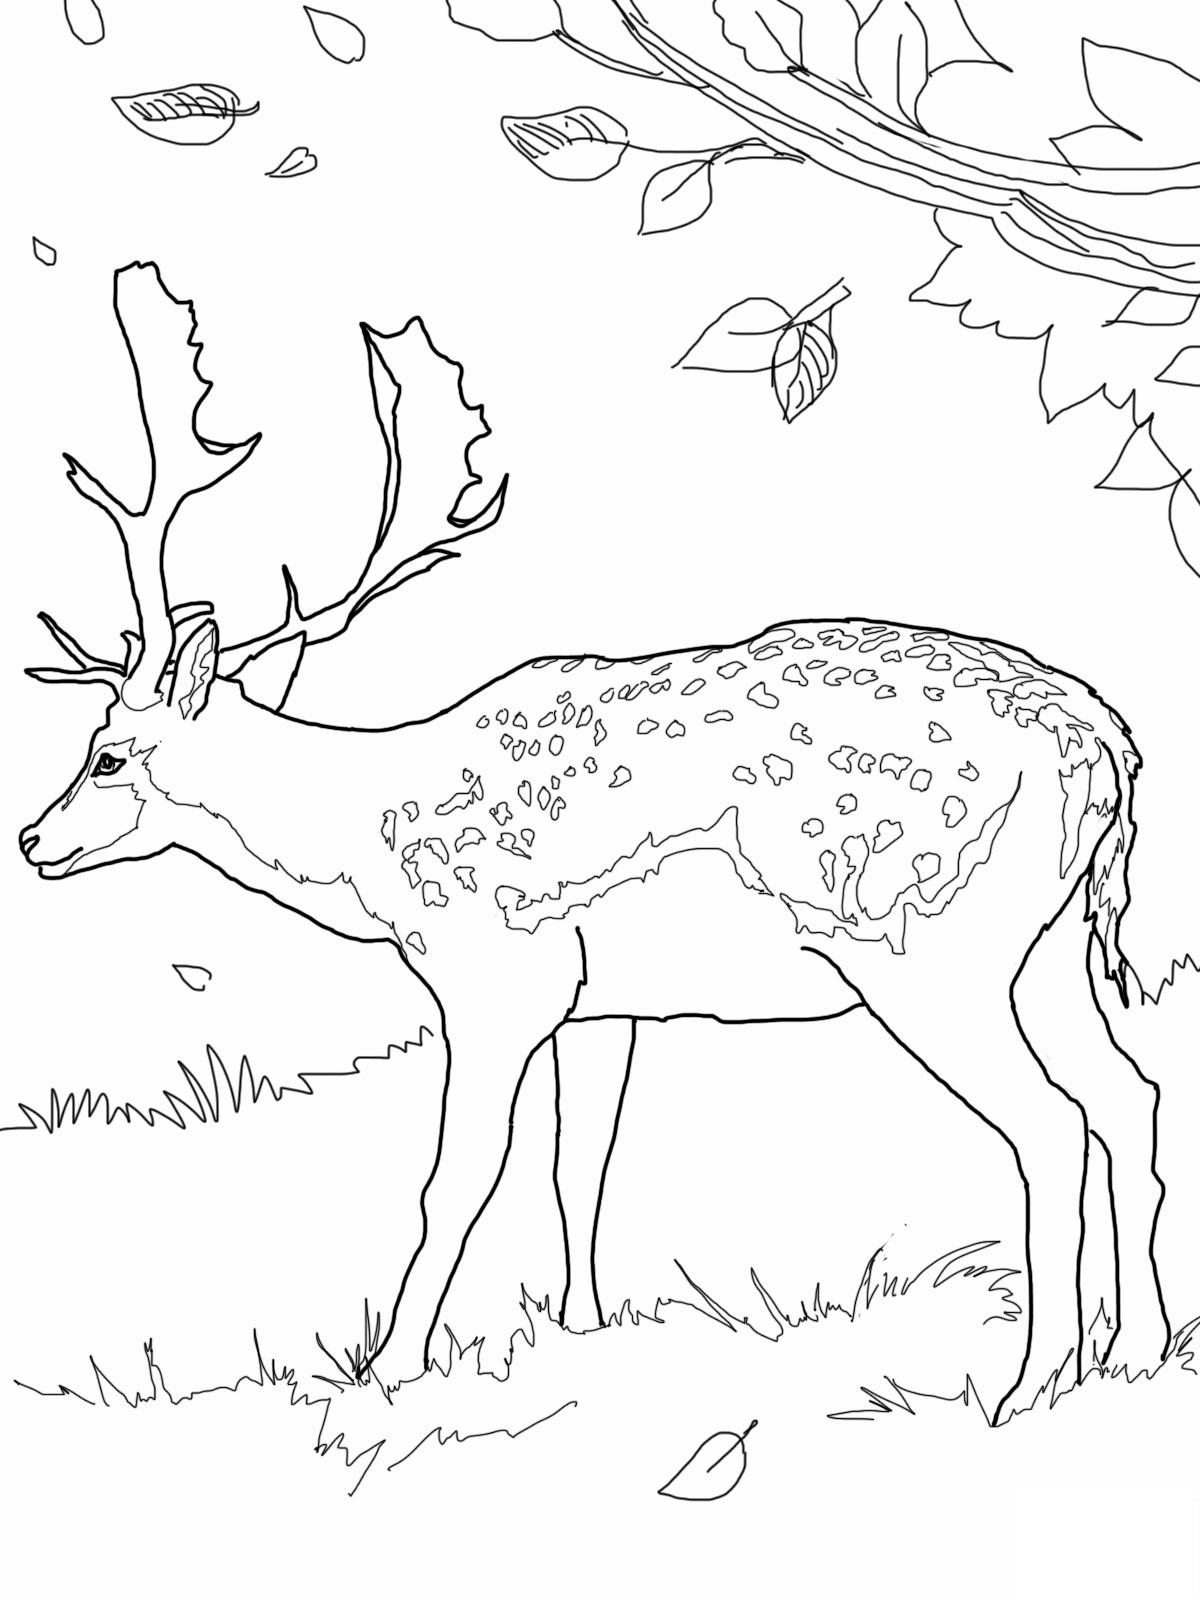 1200x1600 Free Printable Deer Coloring Pages For Kids Free Printable, Free